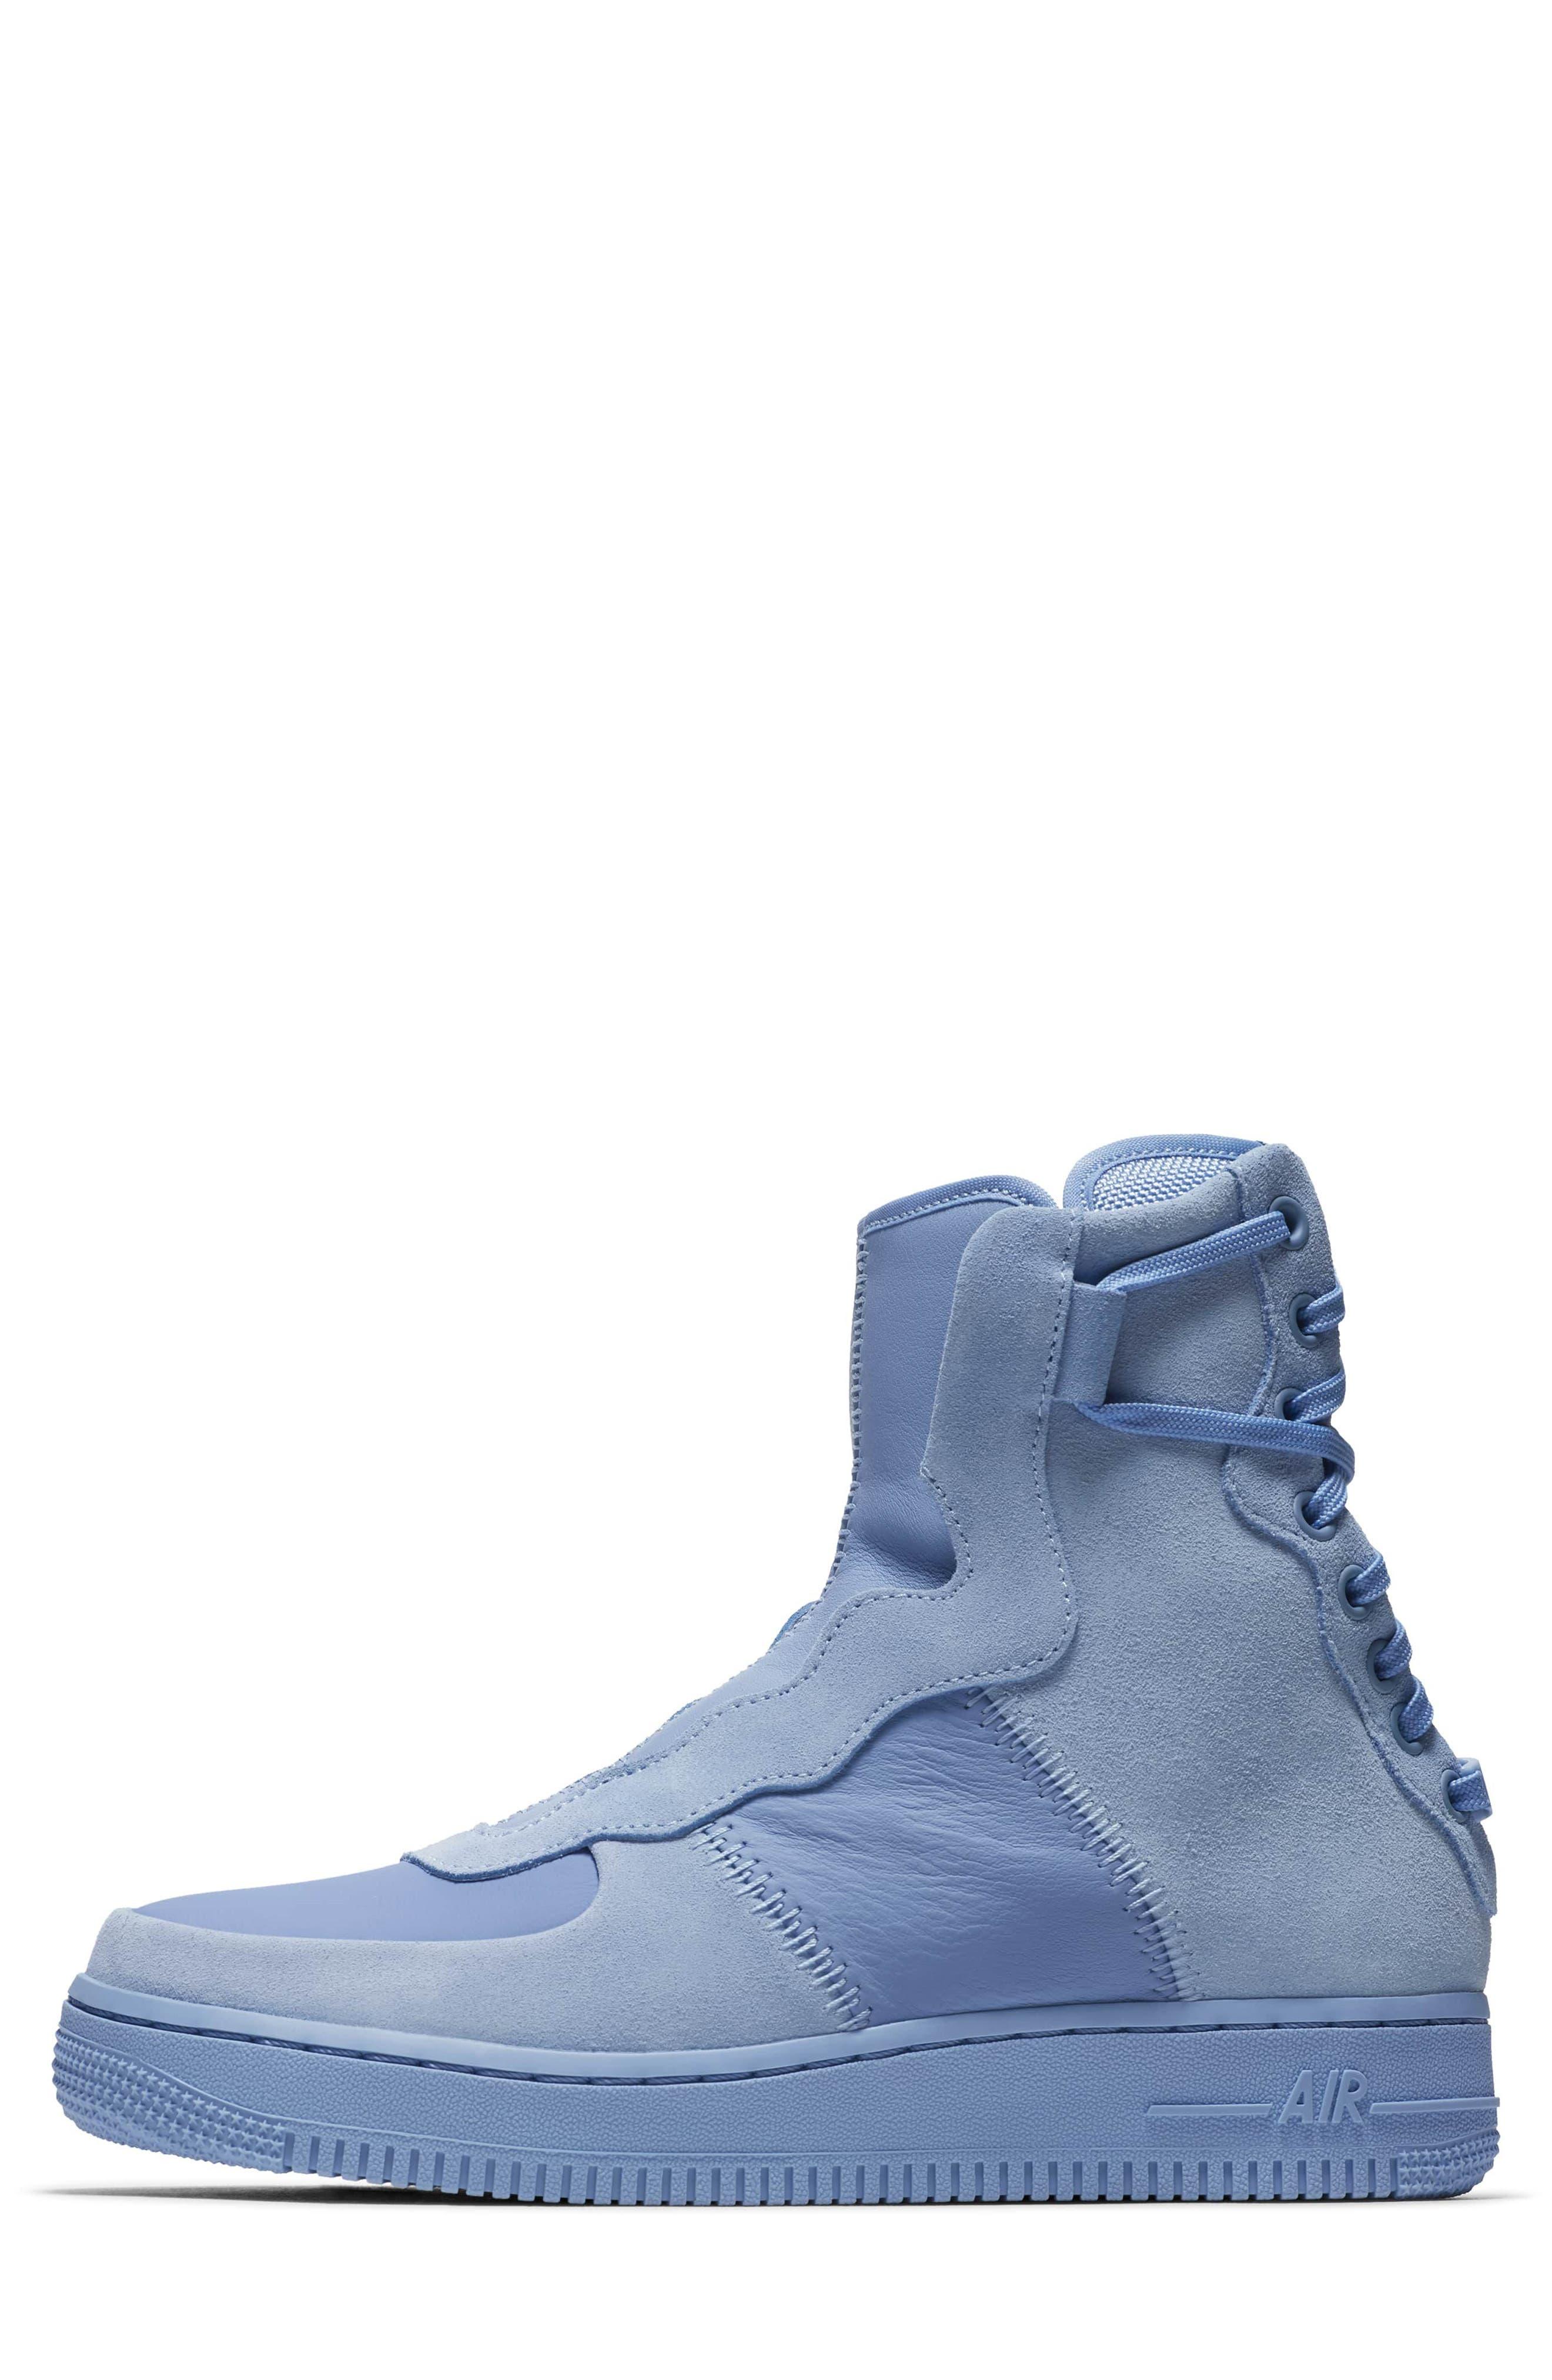 Air Force 1 Rebel XX High Top Sneaker,                             Alternate thumbnail 3, color,                             Light Blue